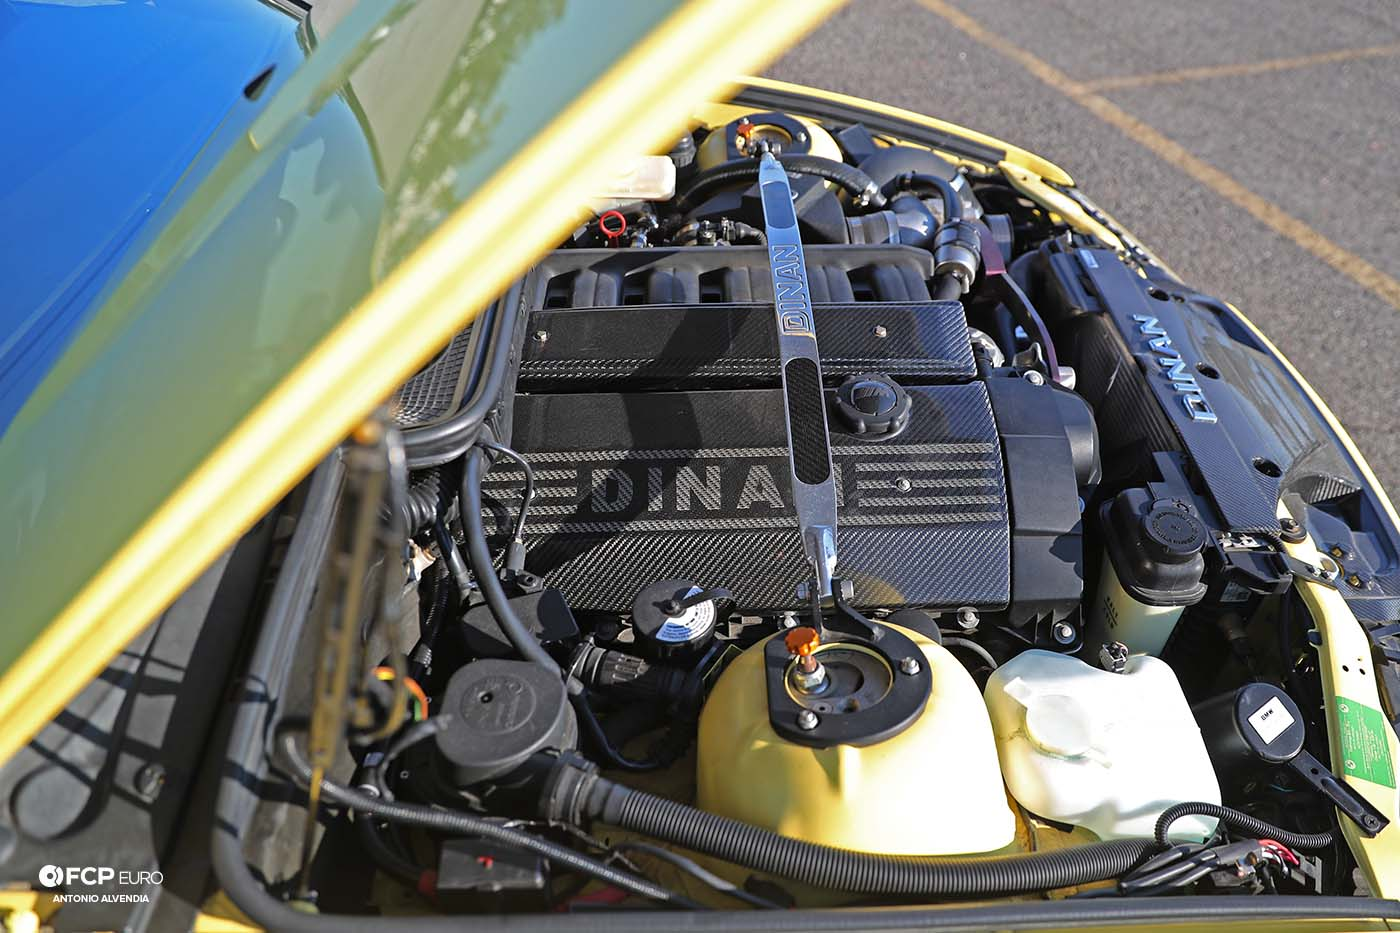 S52 M3 engine Dinan Supercharger